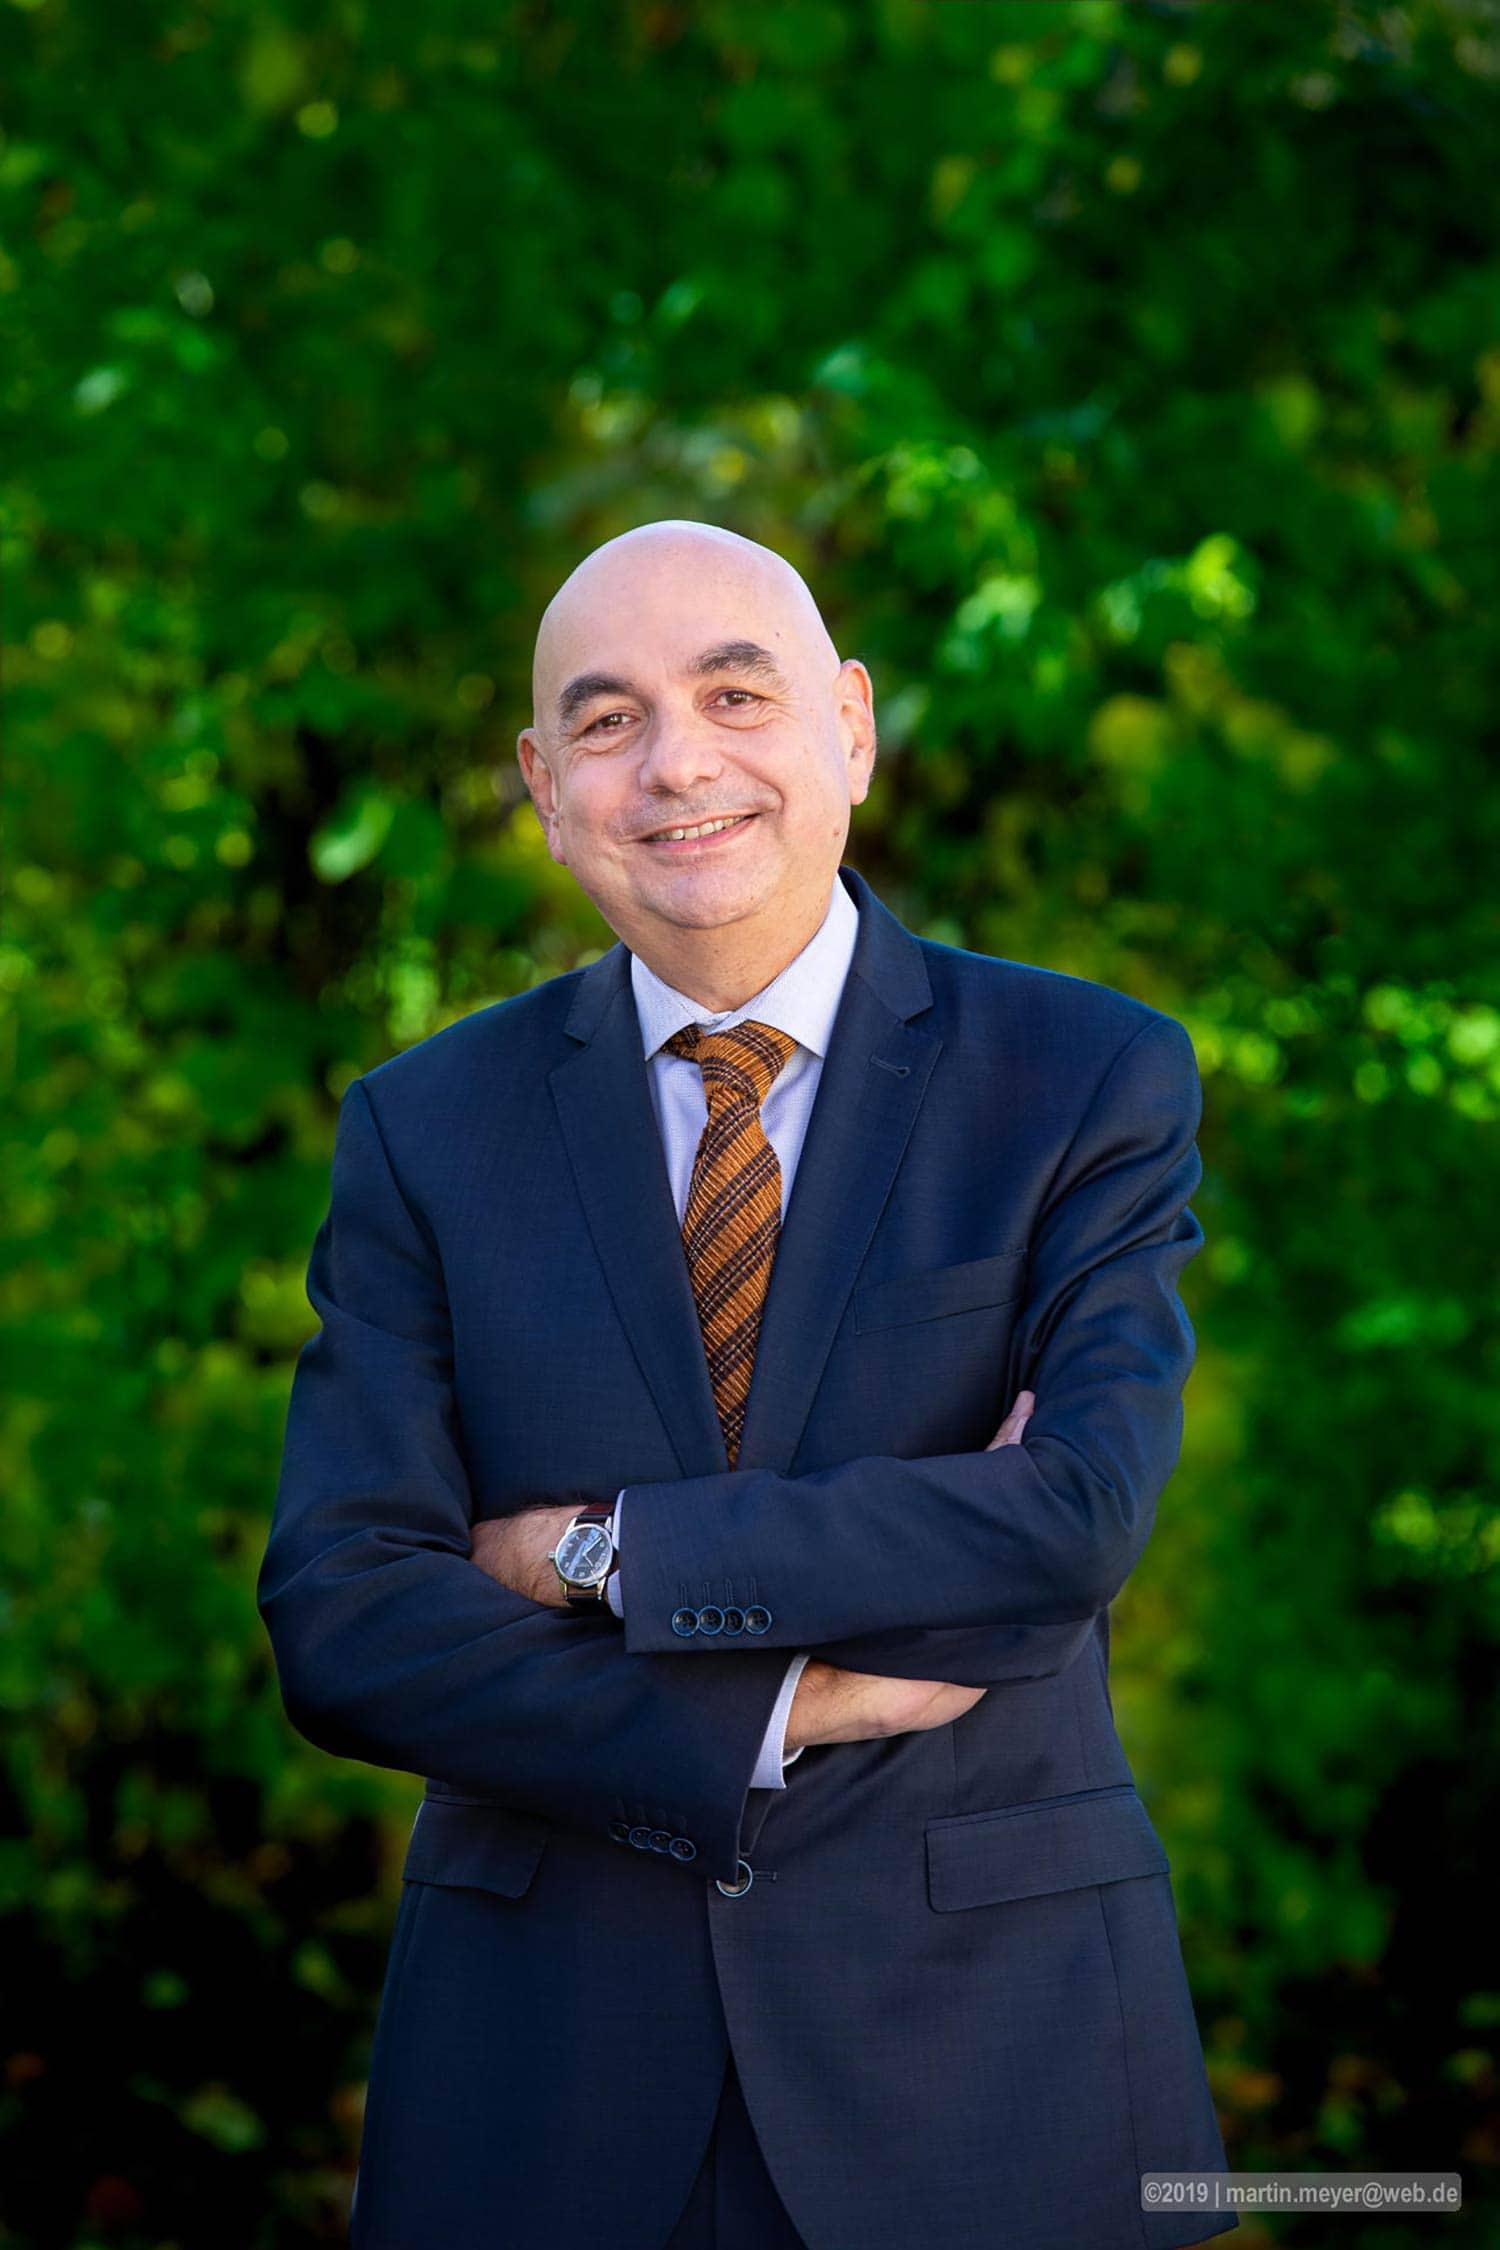 Grüne - Jürgen Mistol (54) Landtagsabgeordneter Fotos: Bündnis 90/Die Grünen